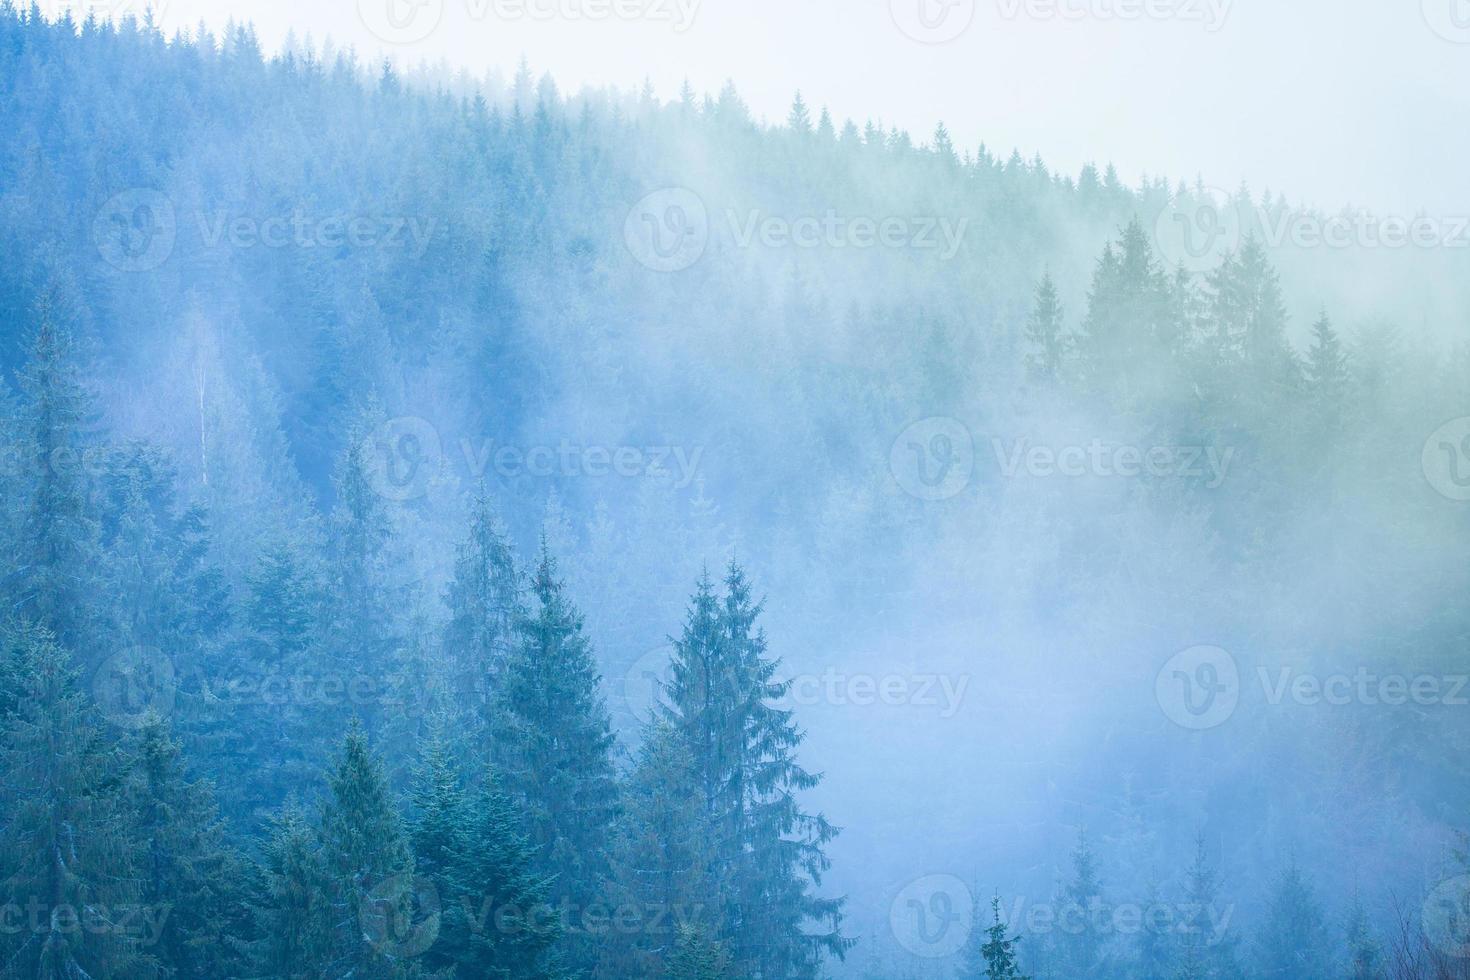 Bosque Misterioso 1318277 Foto De Stock En Vecteezy